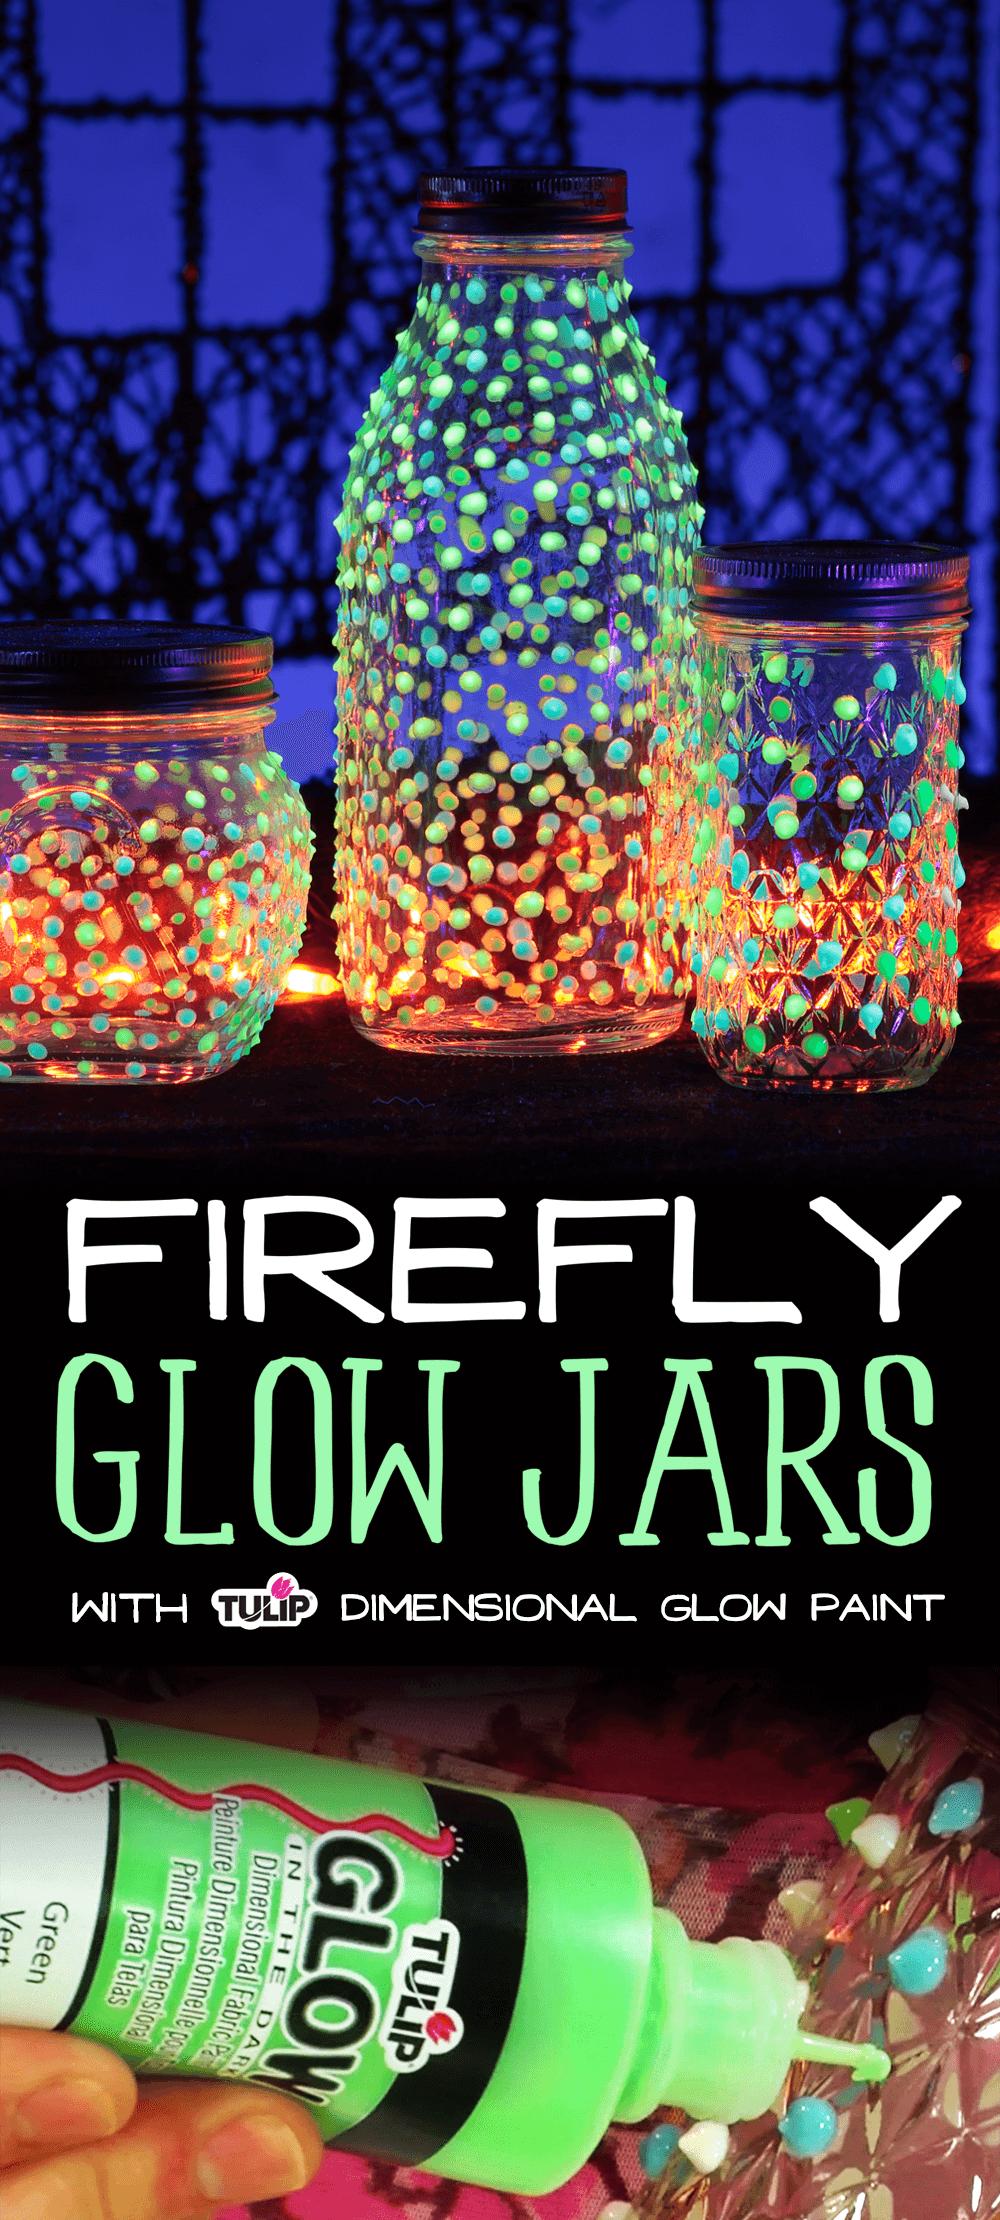 Illuminez la nuit avec les pots Firefly Glow